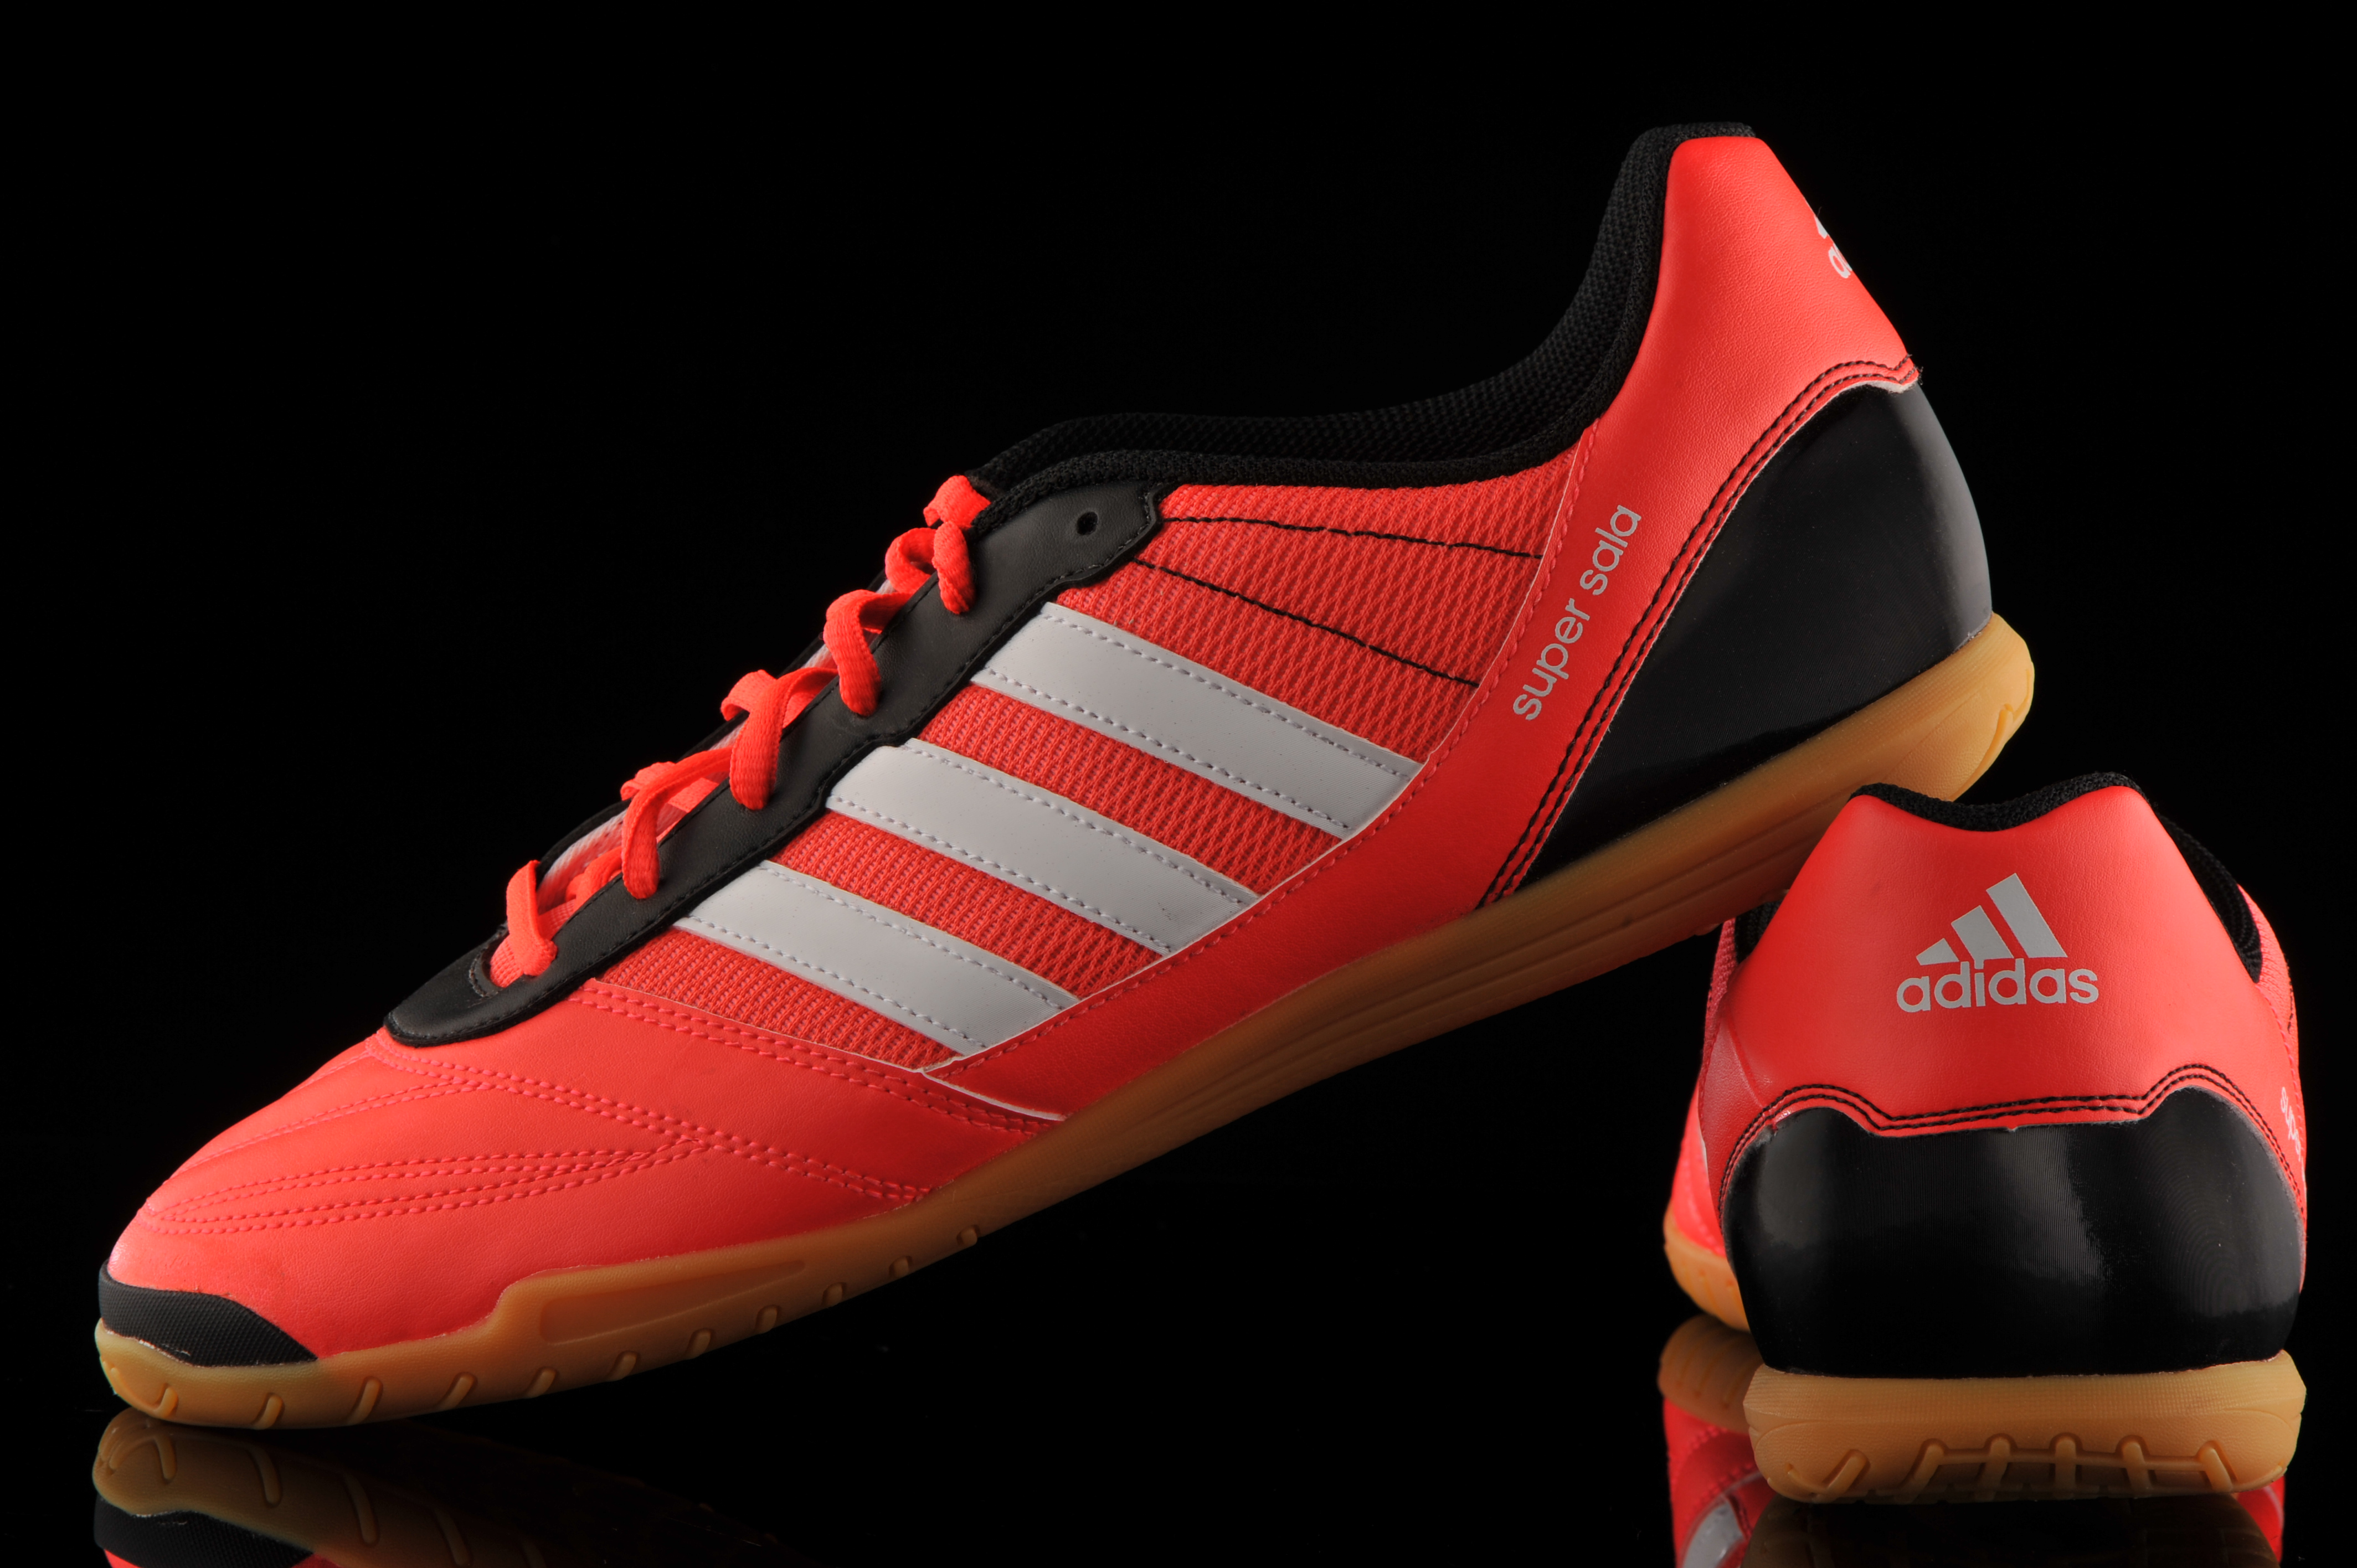 norte Consulta contrabando  adidas Freefootball Supersala G65095   R-GOL.com - Football boots &  equipment